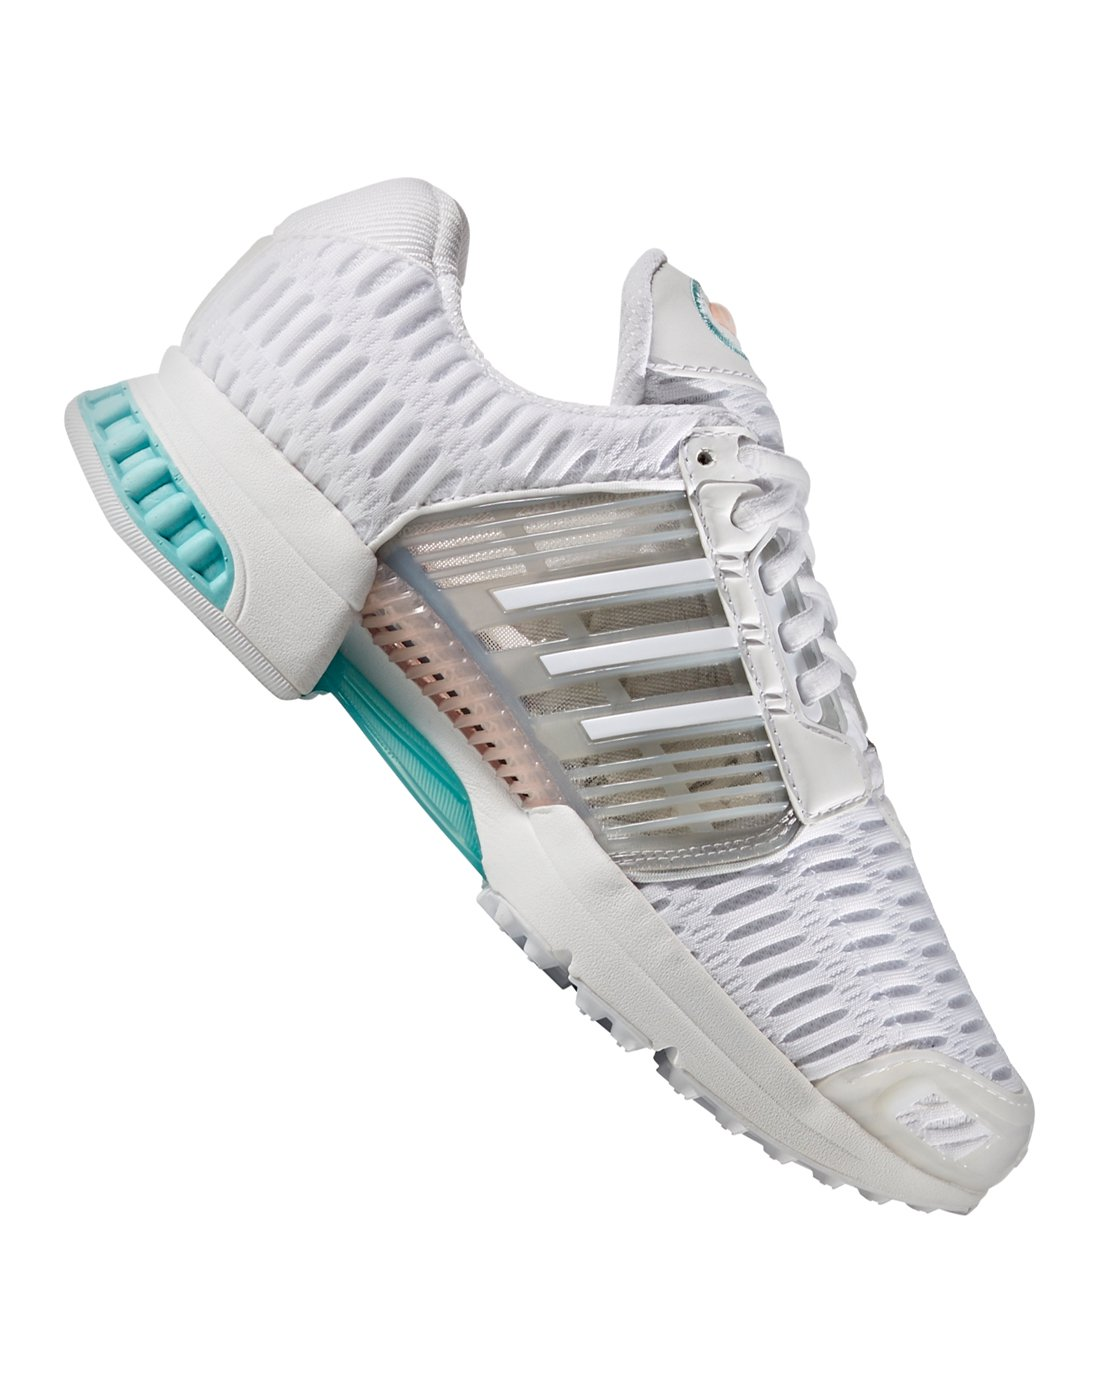 cheaper 06726 cc17d adidas Originals. Womens Climacool 1. Womens Climacool 1 ...